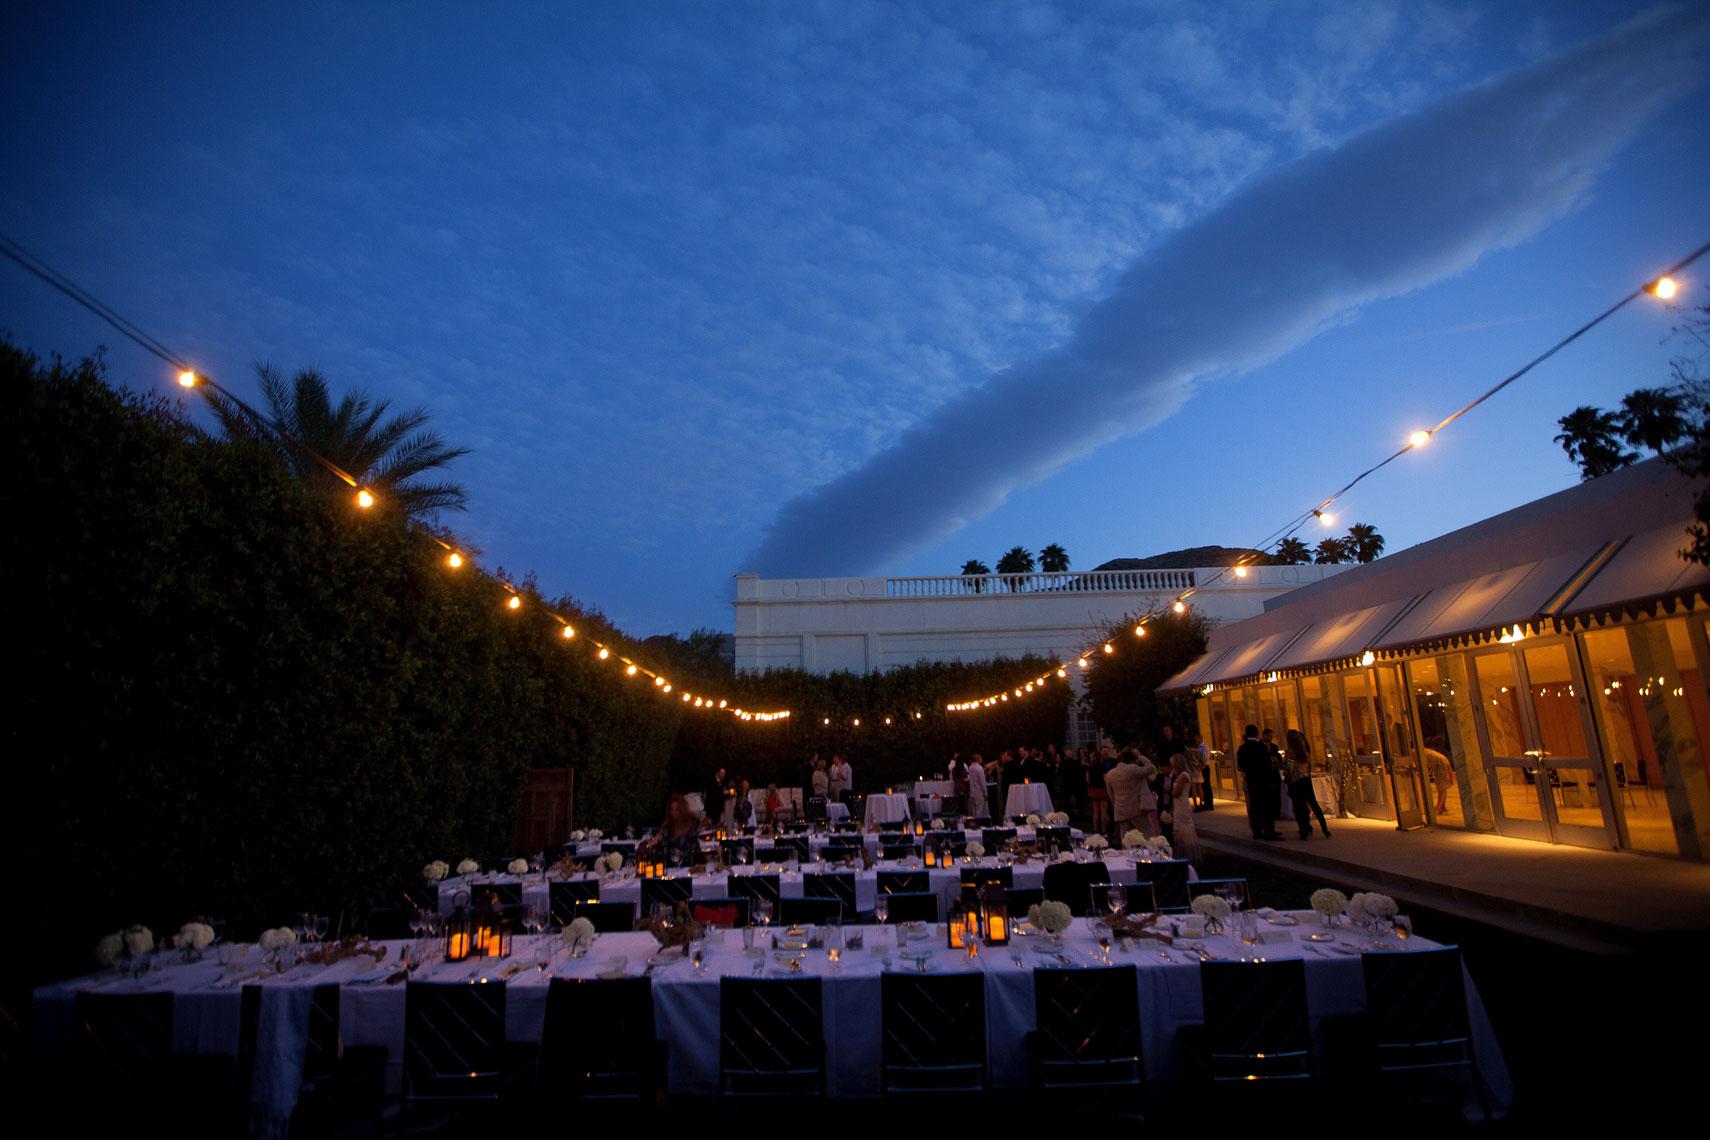 parker palm springs wedding venue photos by nicole caldwell080